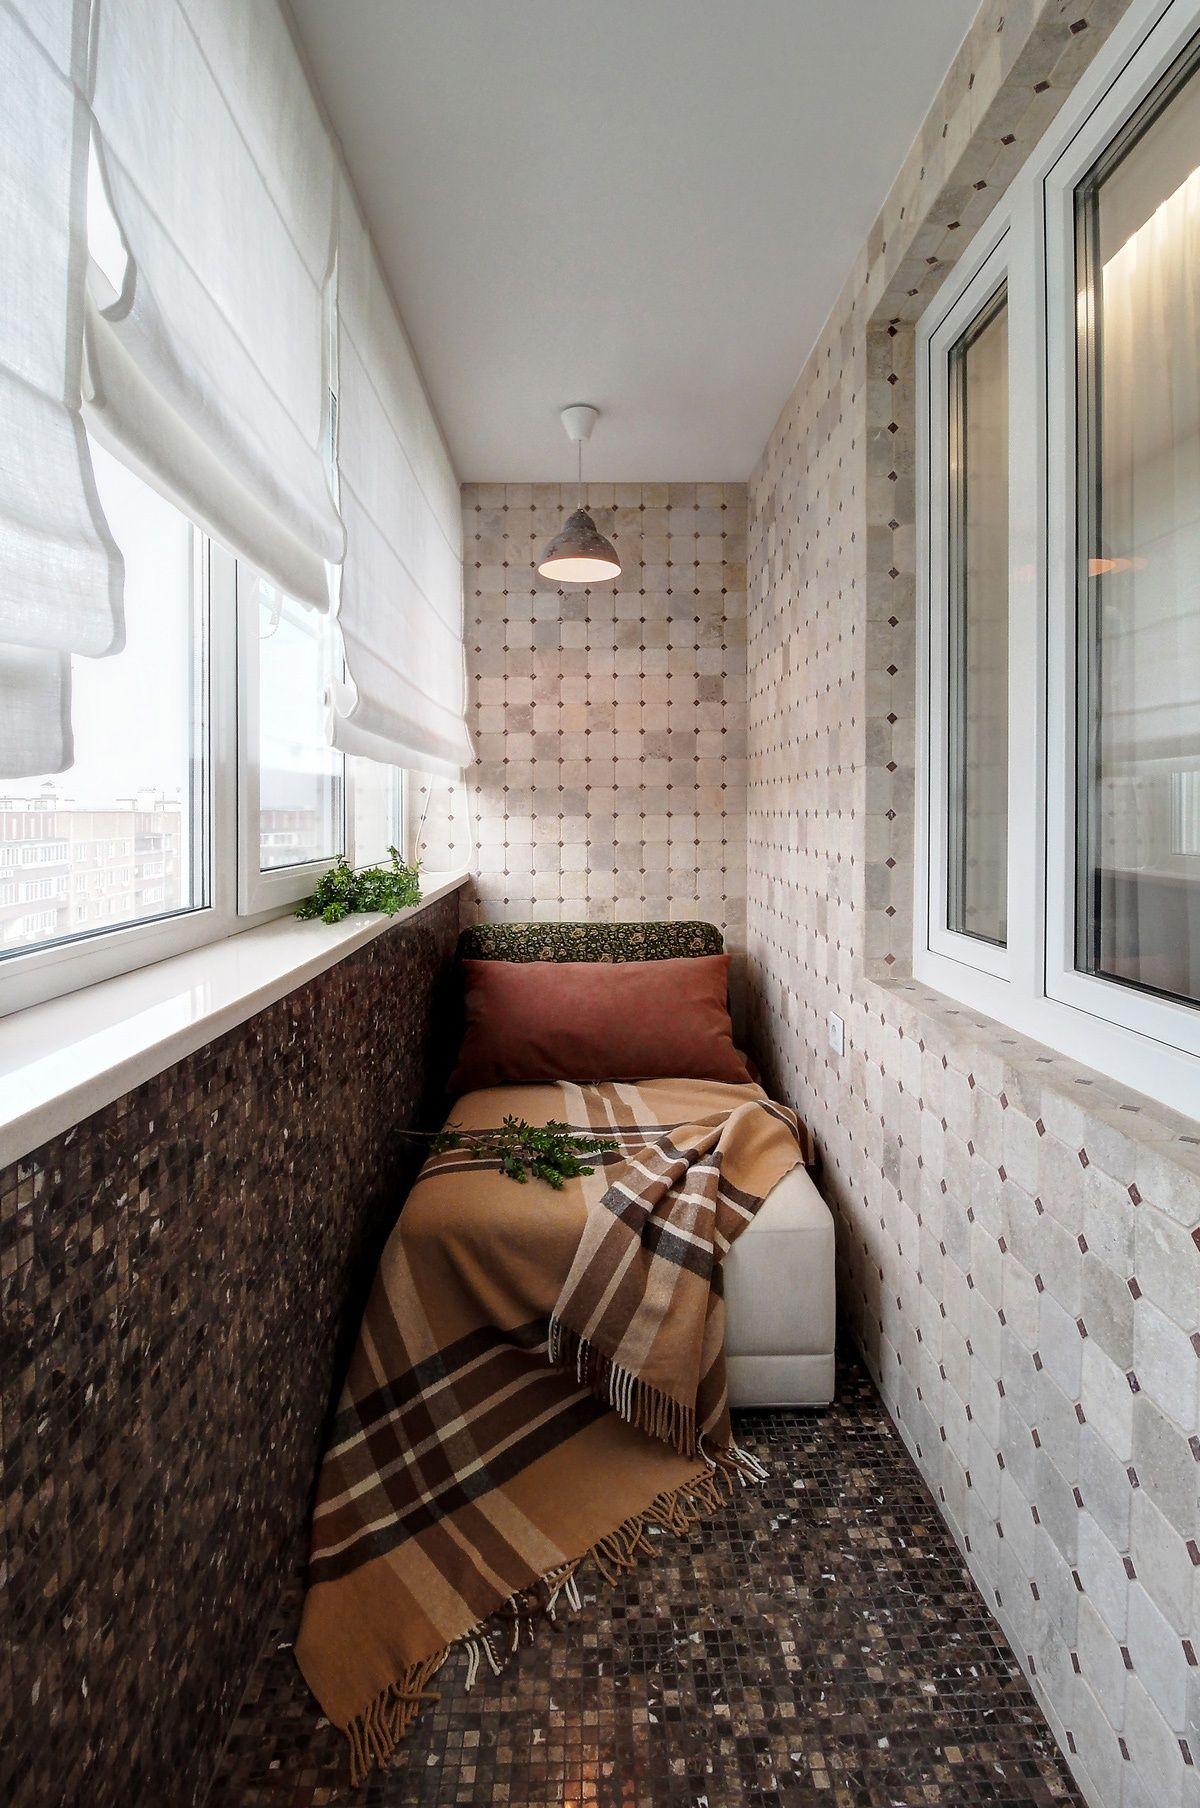 furnishing ideas bedroom platform bed drawer built in wardrobe